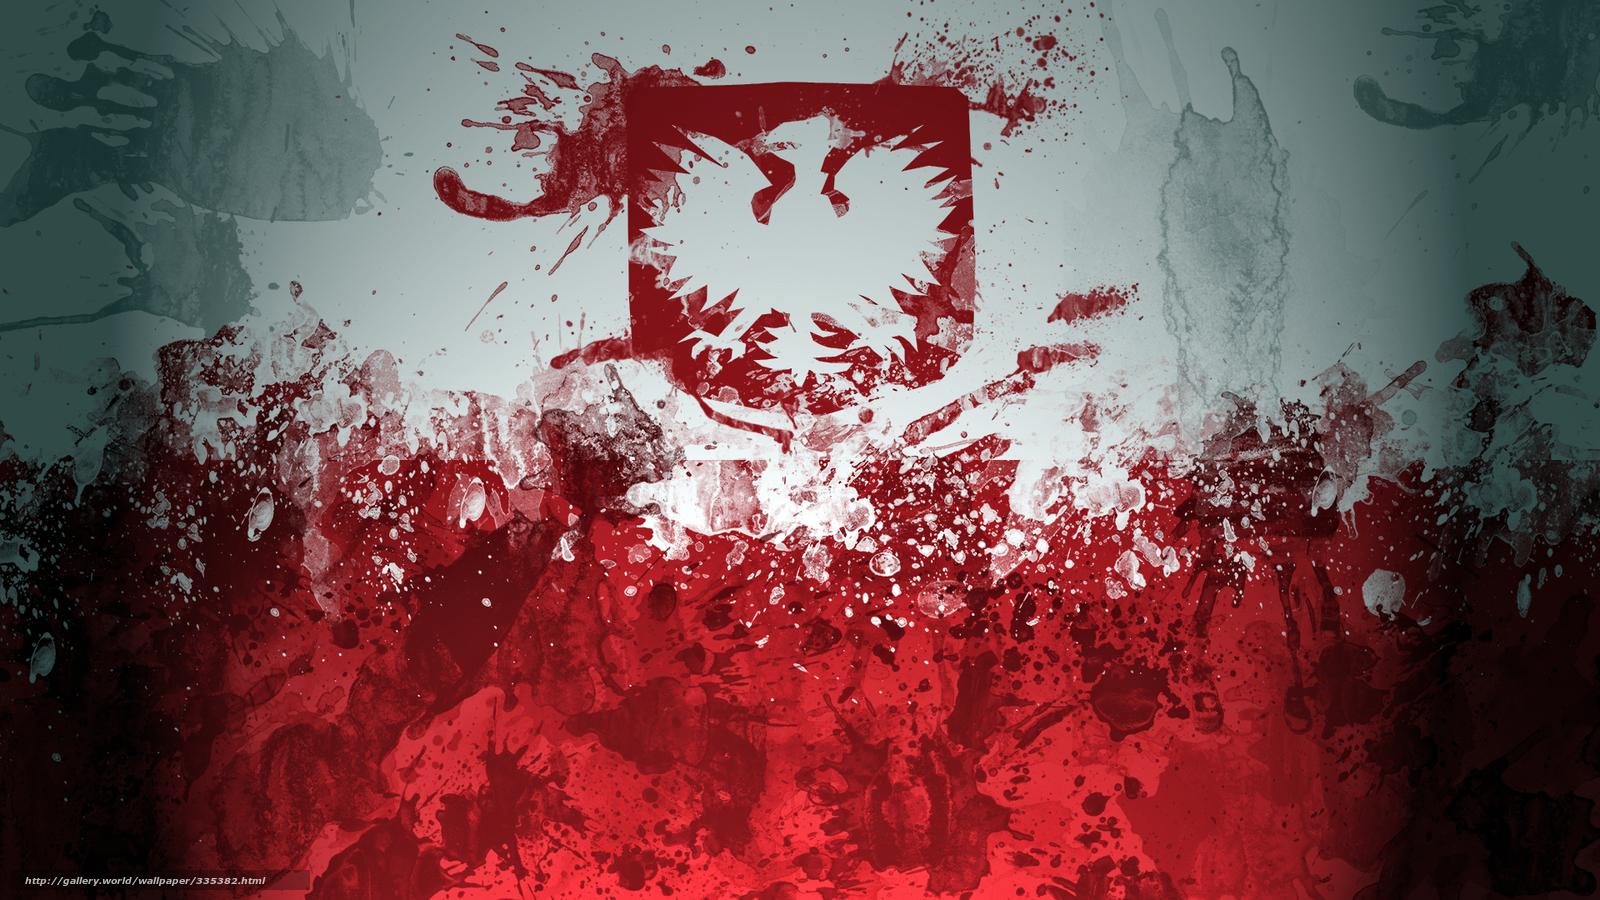 Tapeta flaga, Polska №335382 / Sekcja: Tekstura / pl.HallPic.com